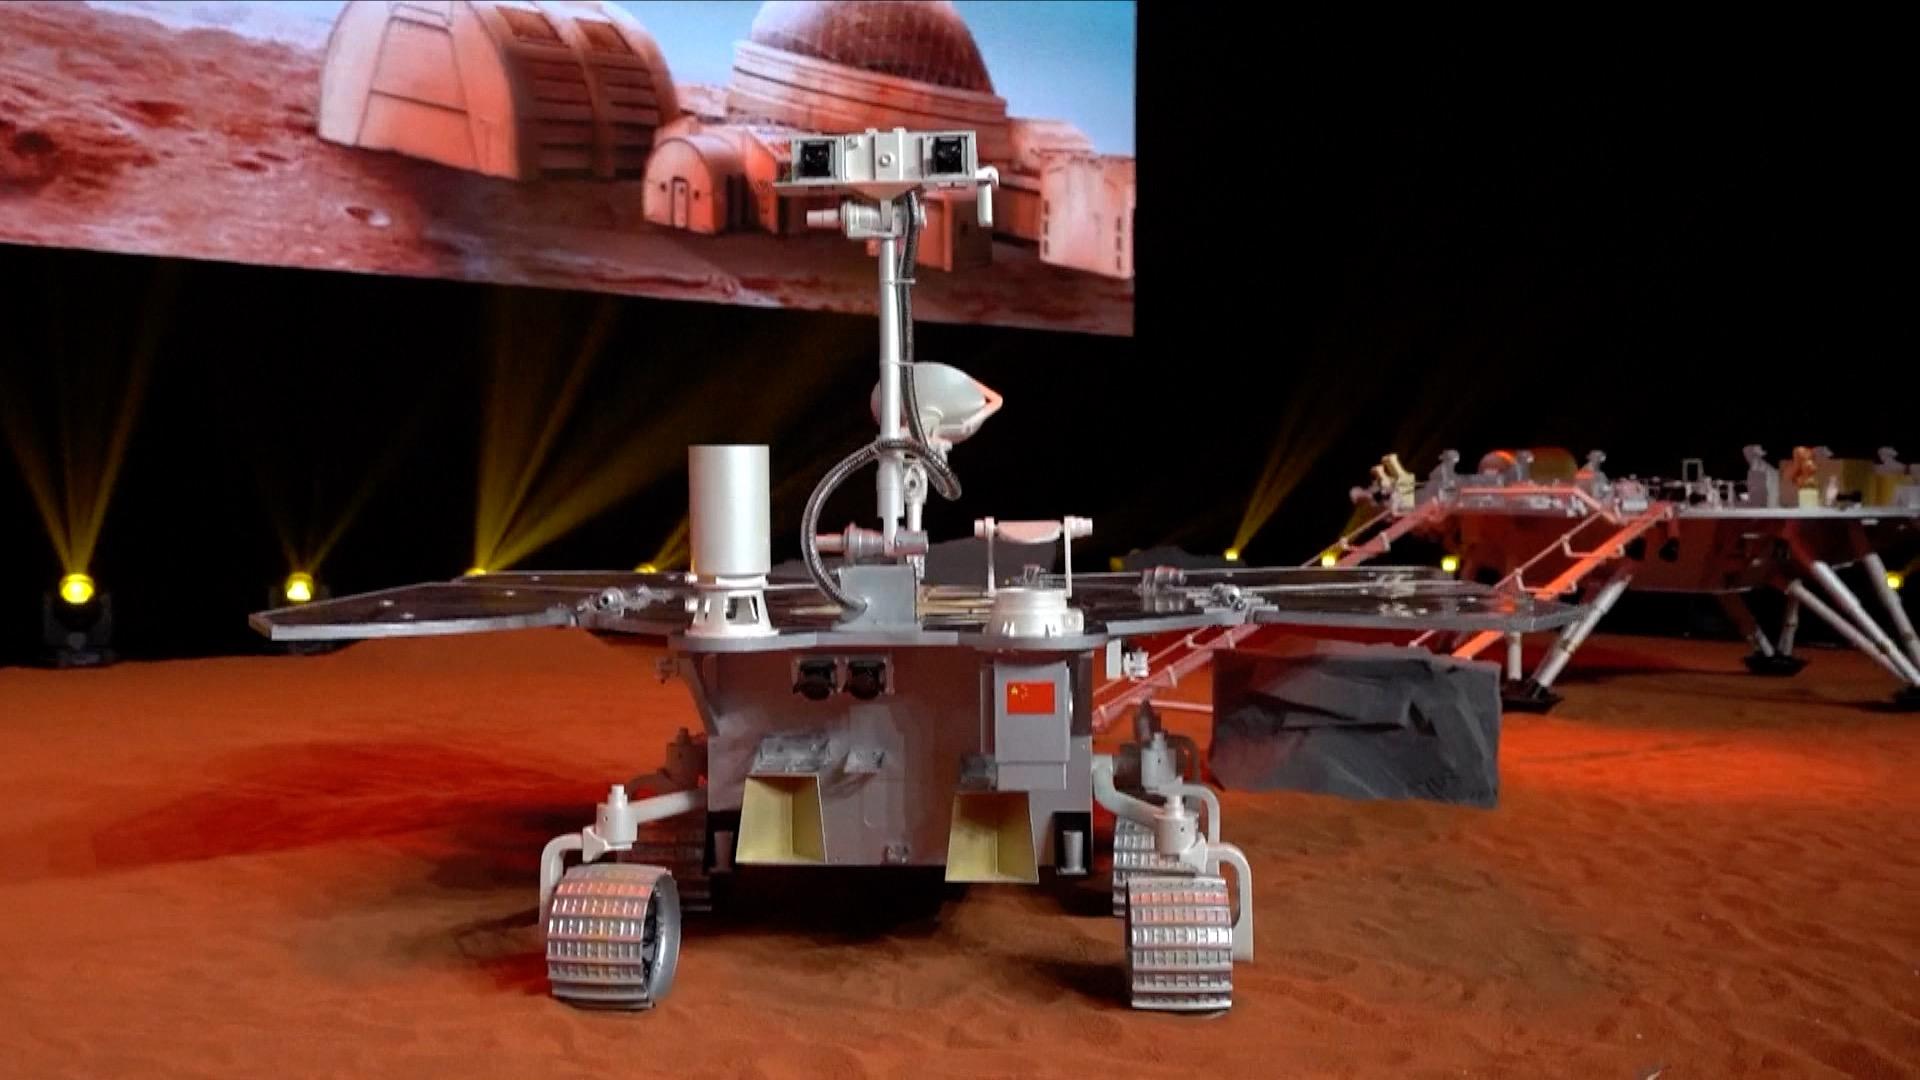 China's Mars probe completes second orbital correction